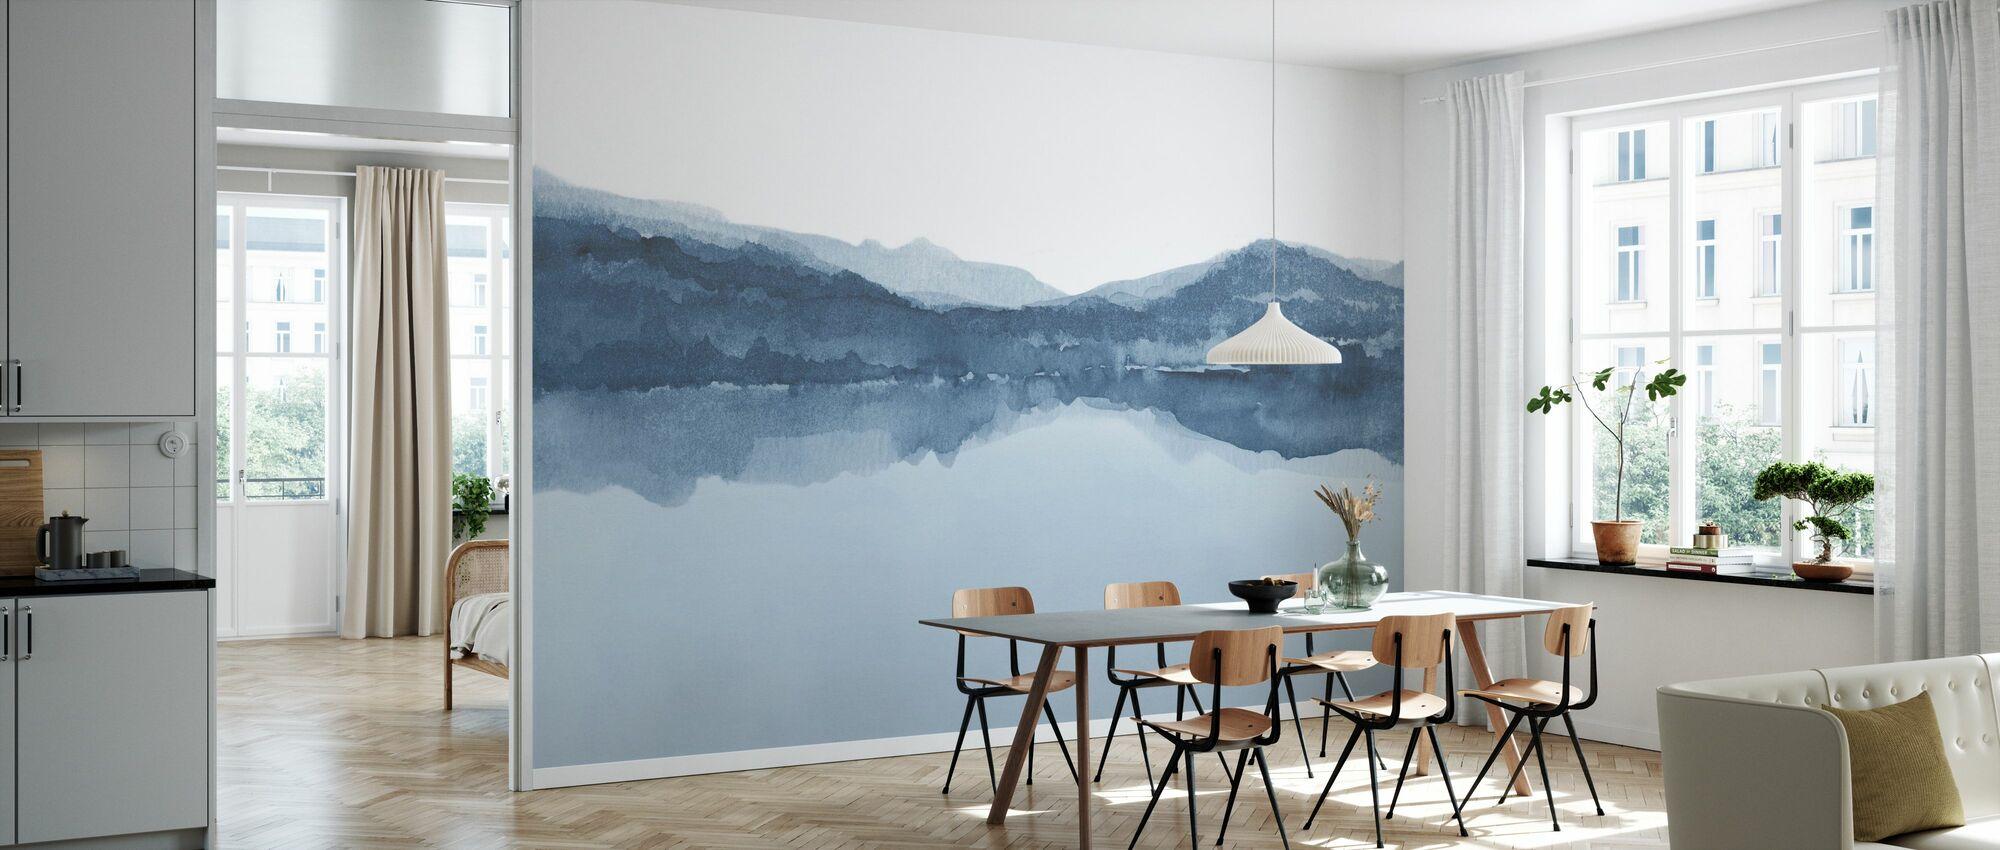 Watercolor Landscape III - Shades of Blue - Wallpaper - Kitchen